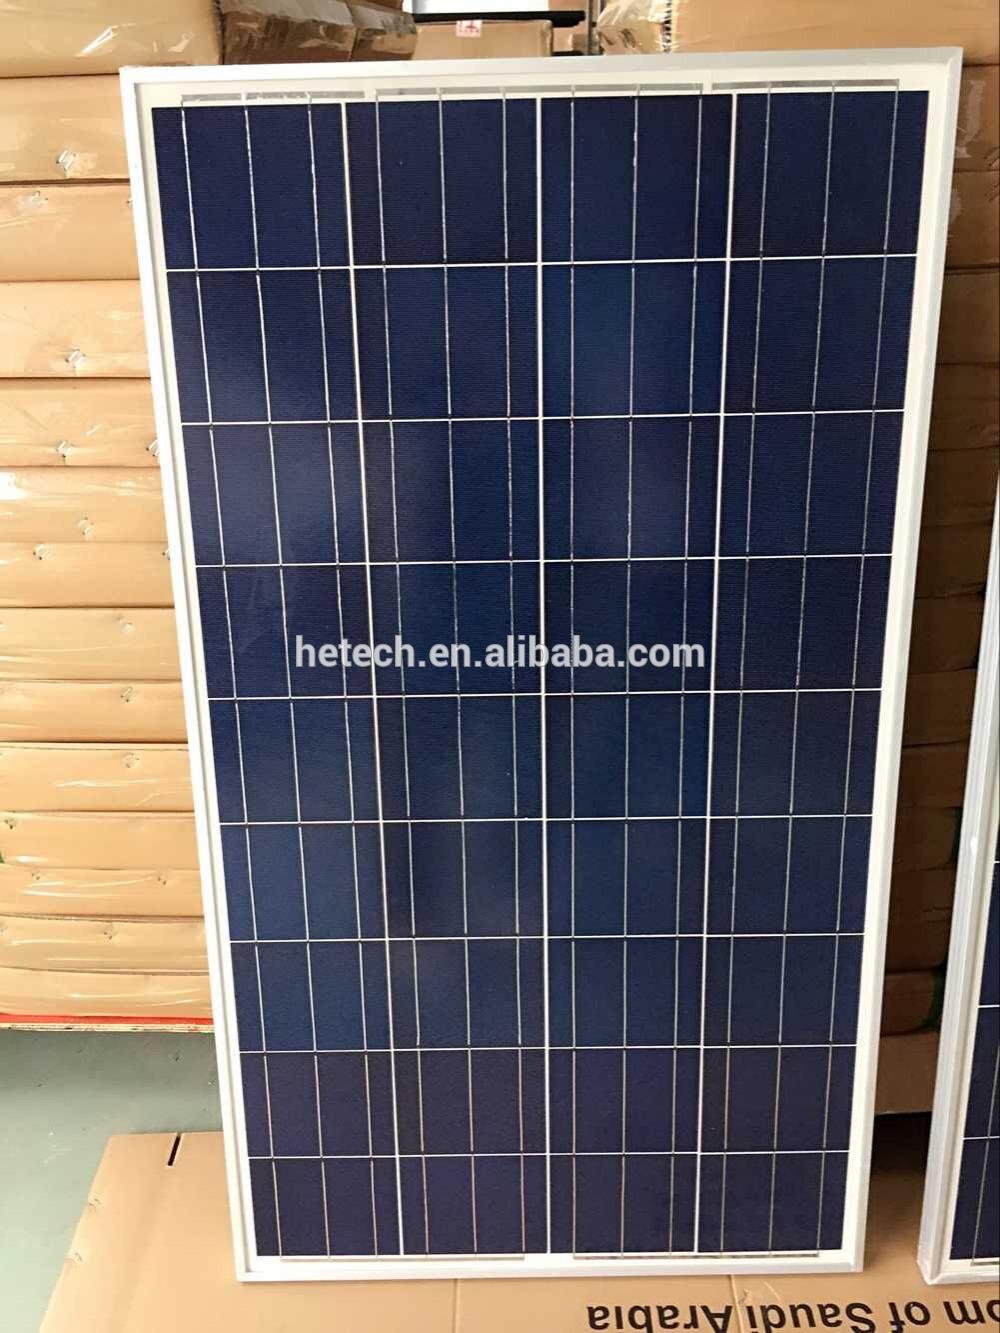 up reviews panel tracks mitsubishi flat roof kit projects residential panasonic prosolar solar sanyo panels system tile tilt with